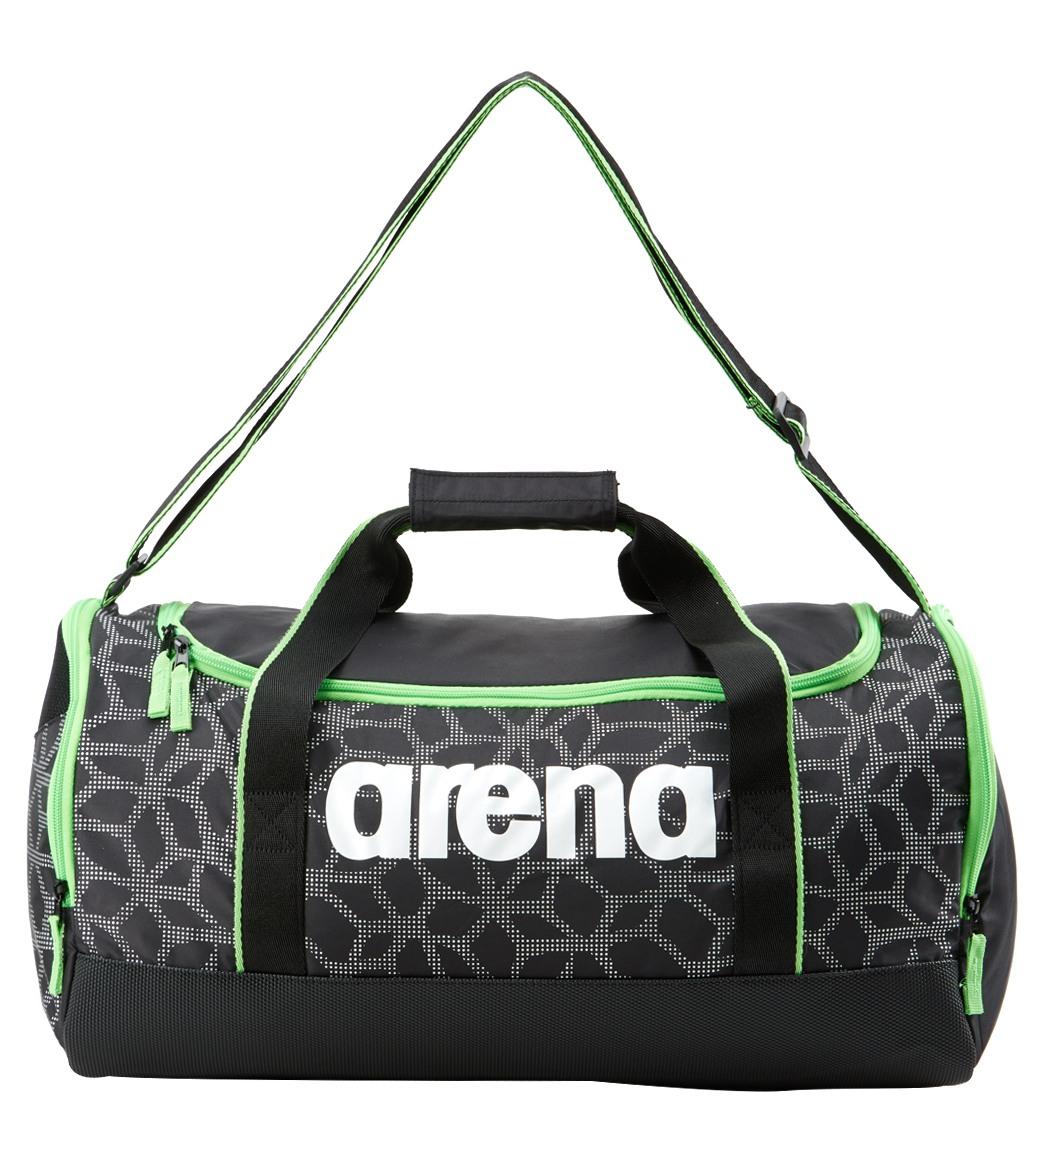 718d1a7d9ab8 Arena Spiky 2 X-Pivot Printed Medium Duffle Bag